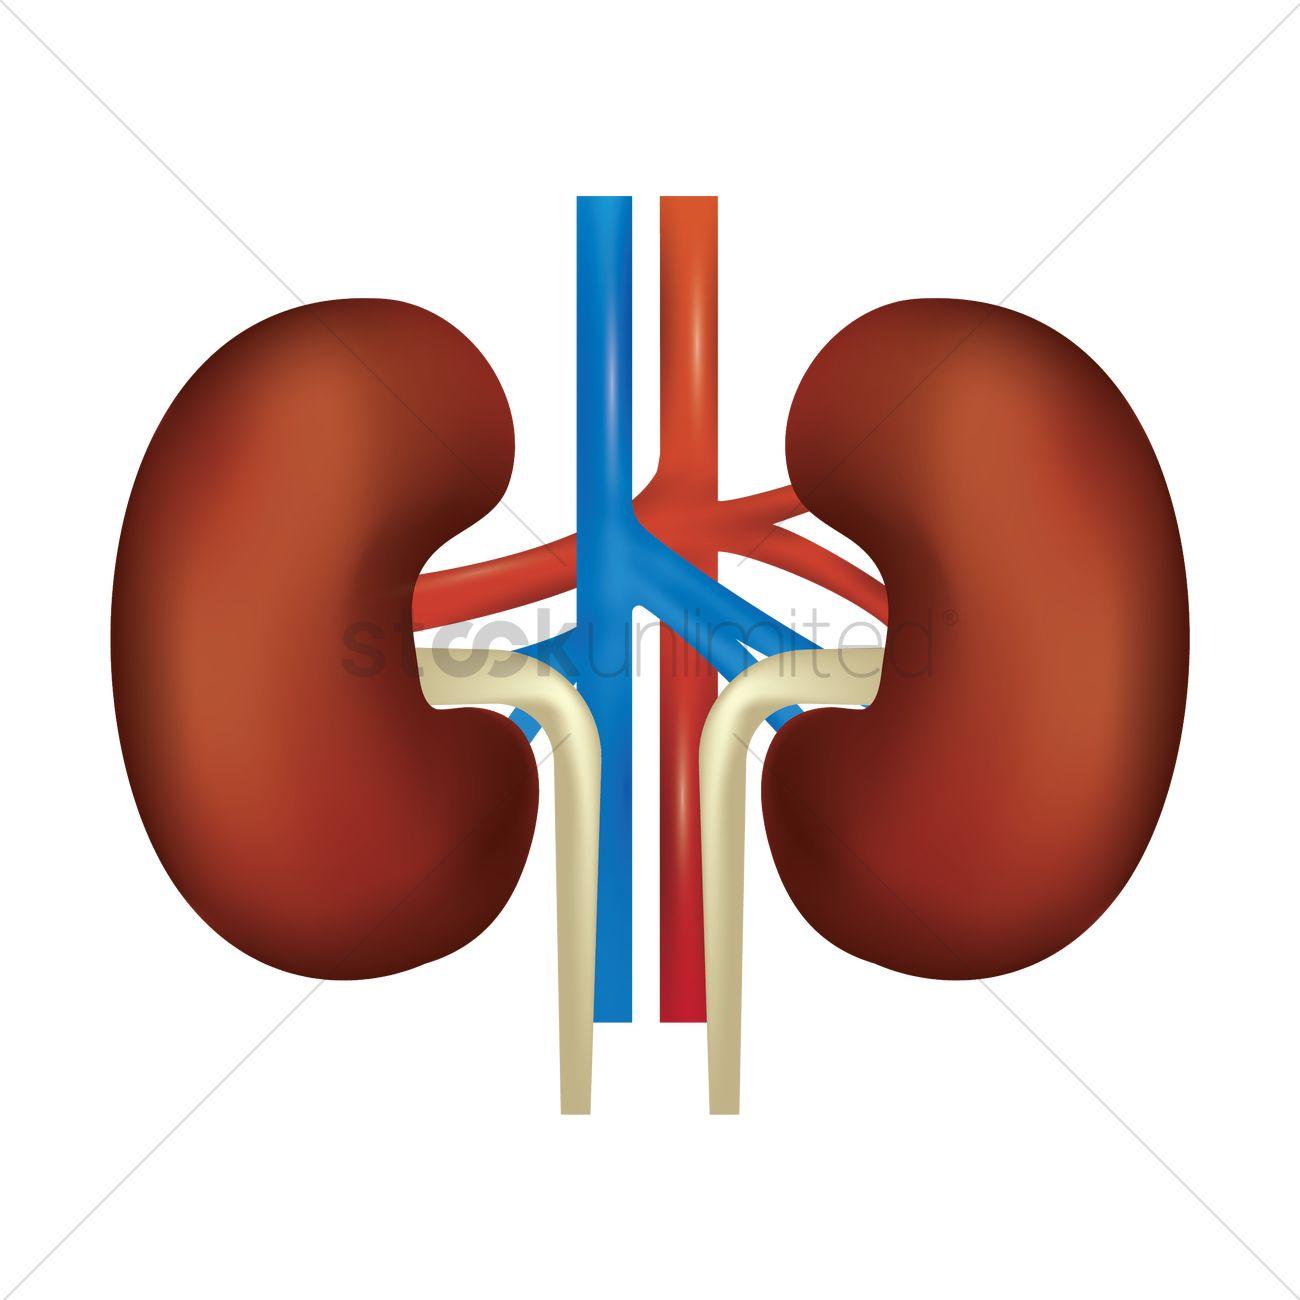 Human Kidney Vector Image 1866360 Stockunlimited